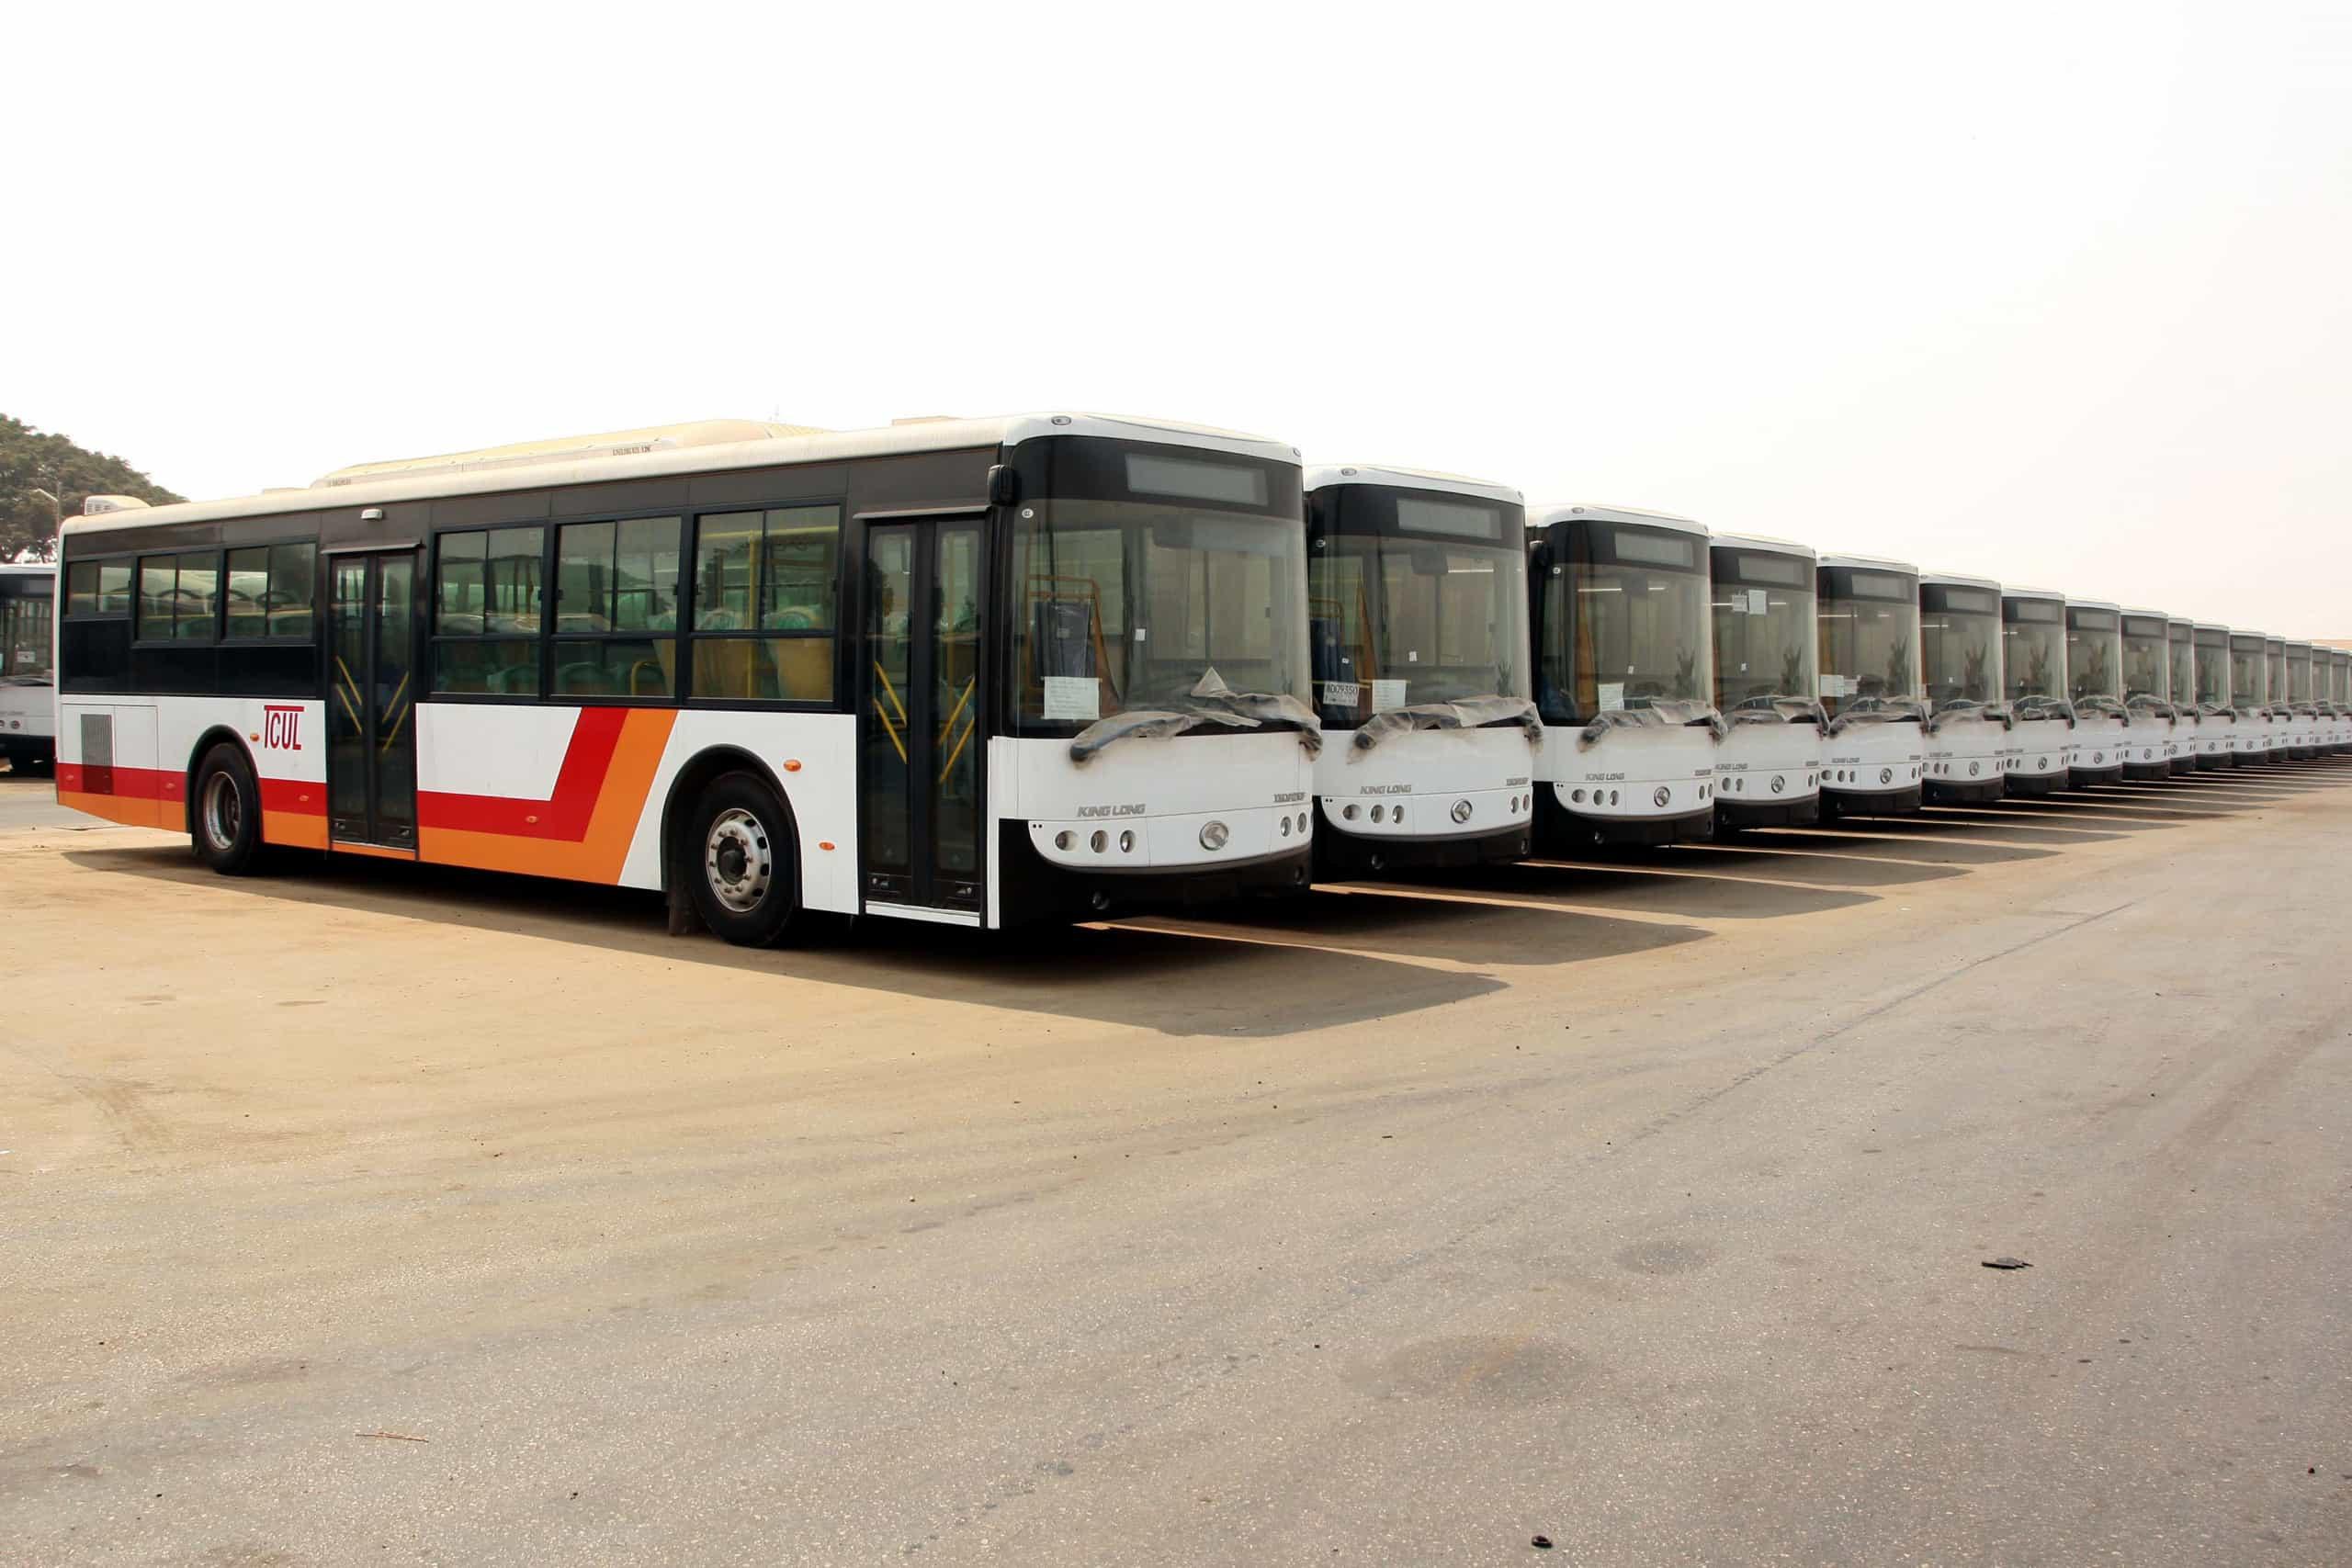 Luanda: Ensaios no sistema eletrónico de bilhética nos transportes